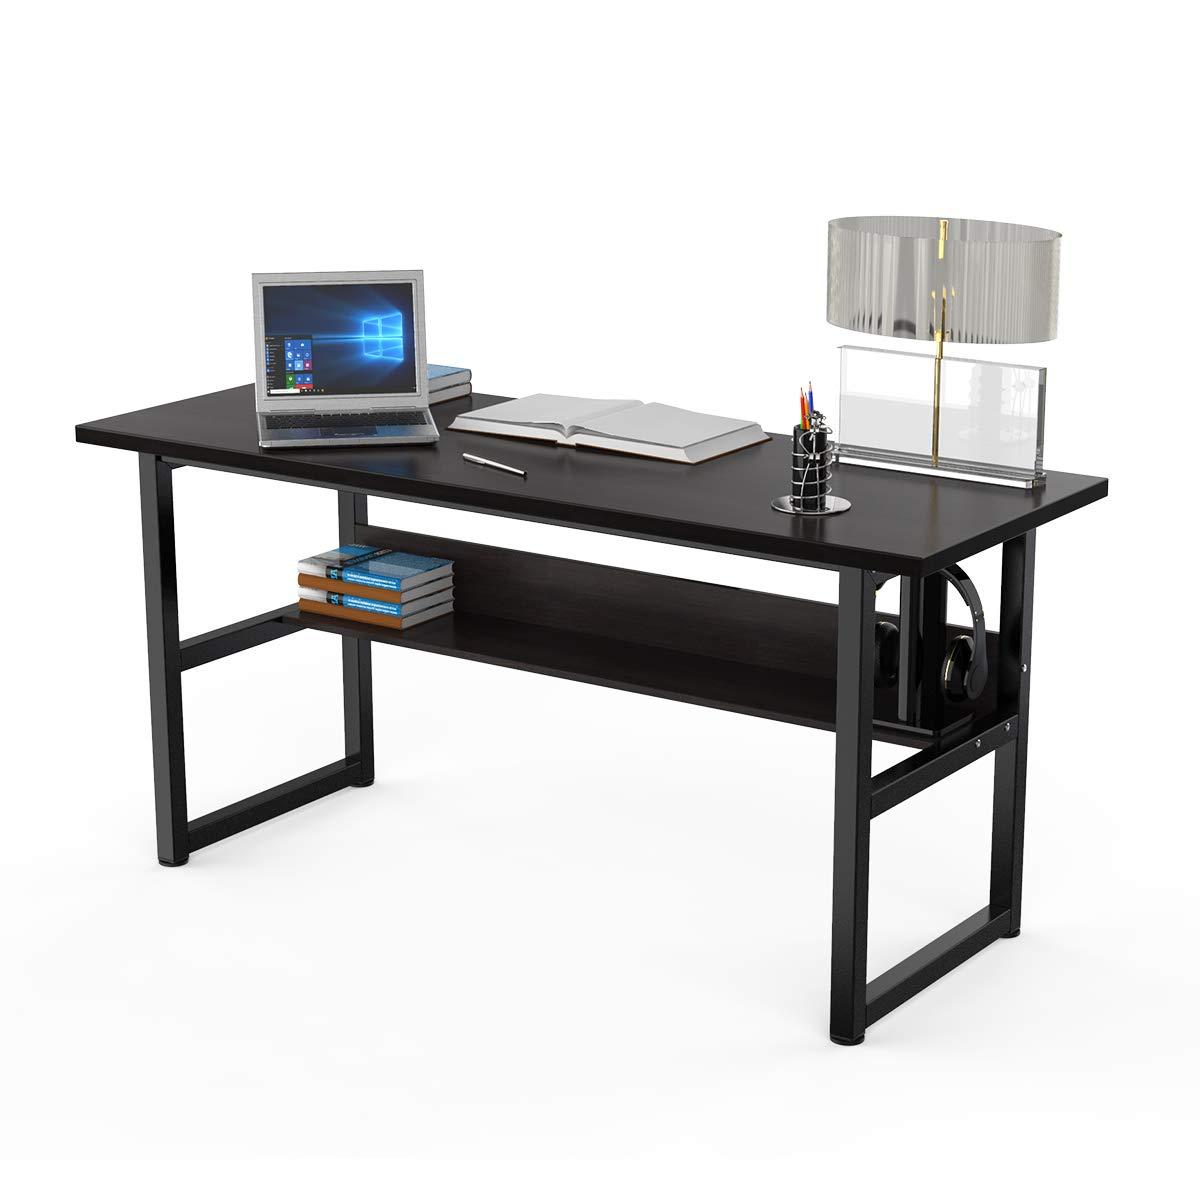 "Computer Desk Office Desk with Bookshelf 63"" Gaming Desk Workstation PC Laptop Study Writing Table for Home Office(63'' Black Walnut)"